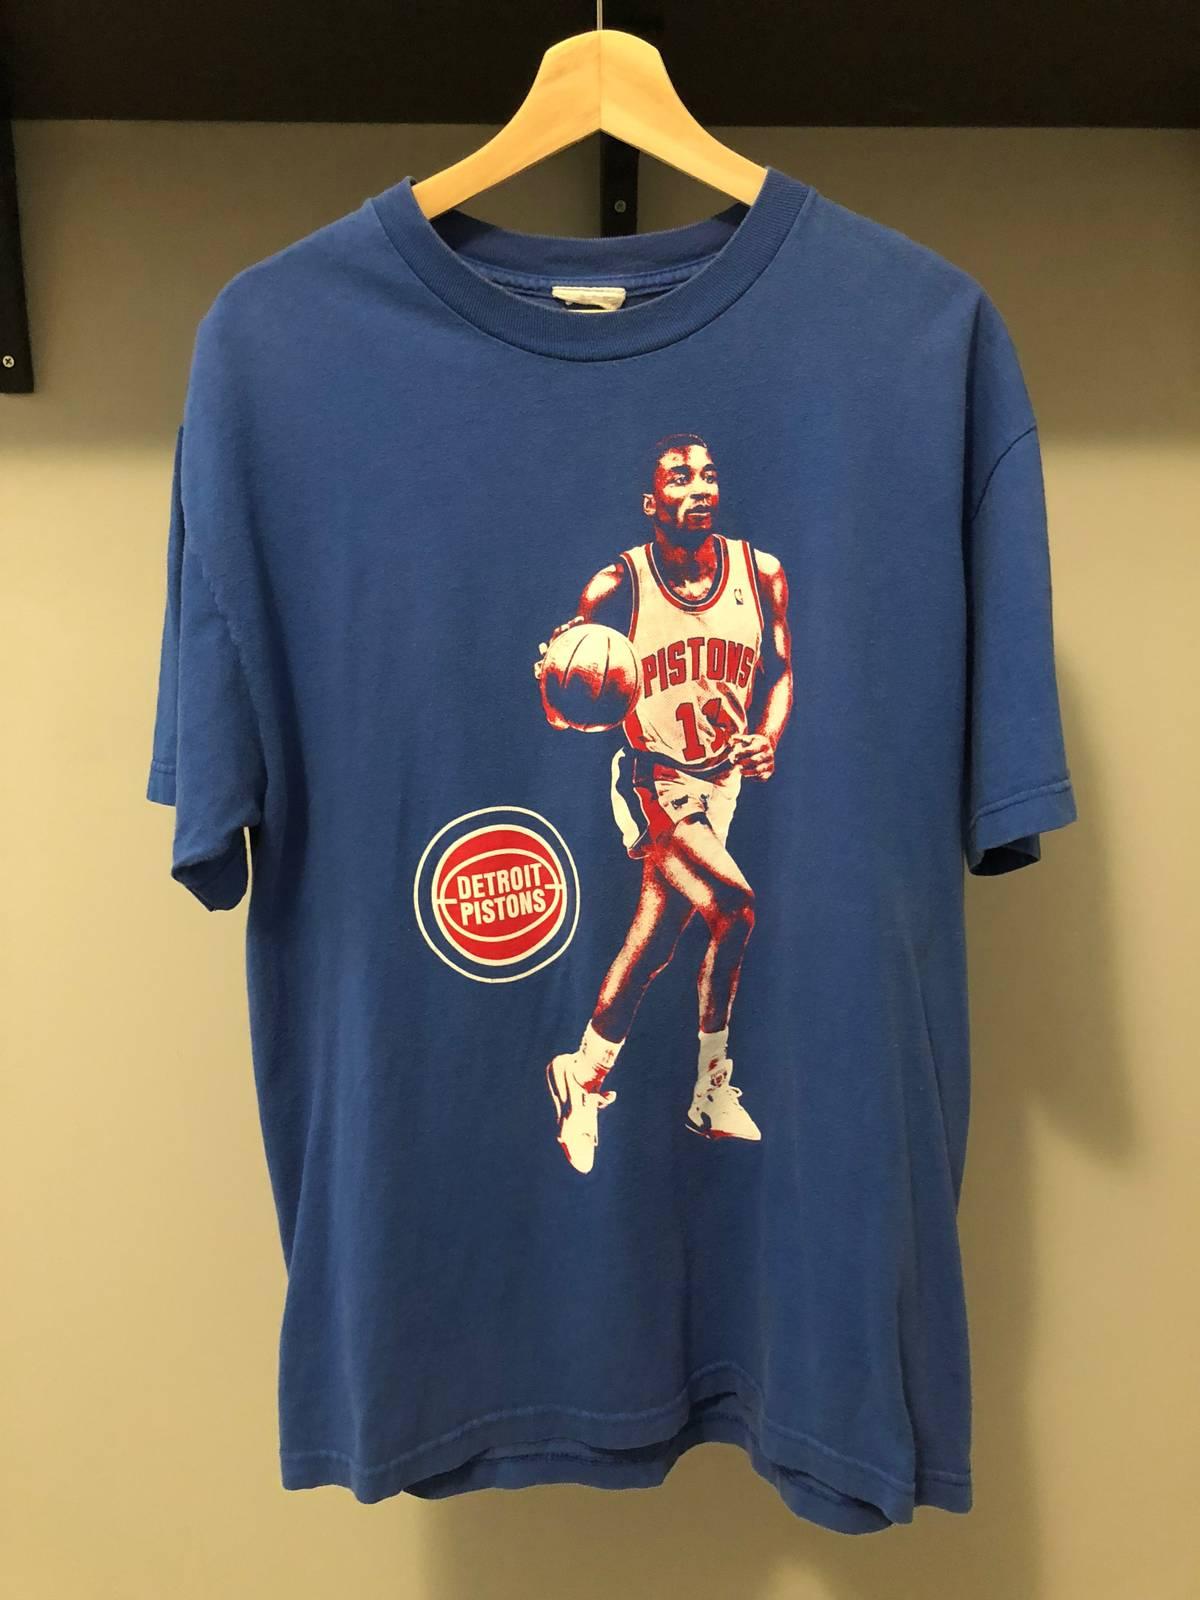 premium selection 6ae83 10bec Vintage Vintage Isaiah Thomas Detroit Pistons Zeke Bad Boys T Shirt Size L  $27